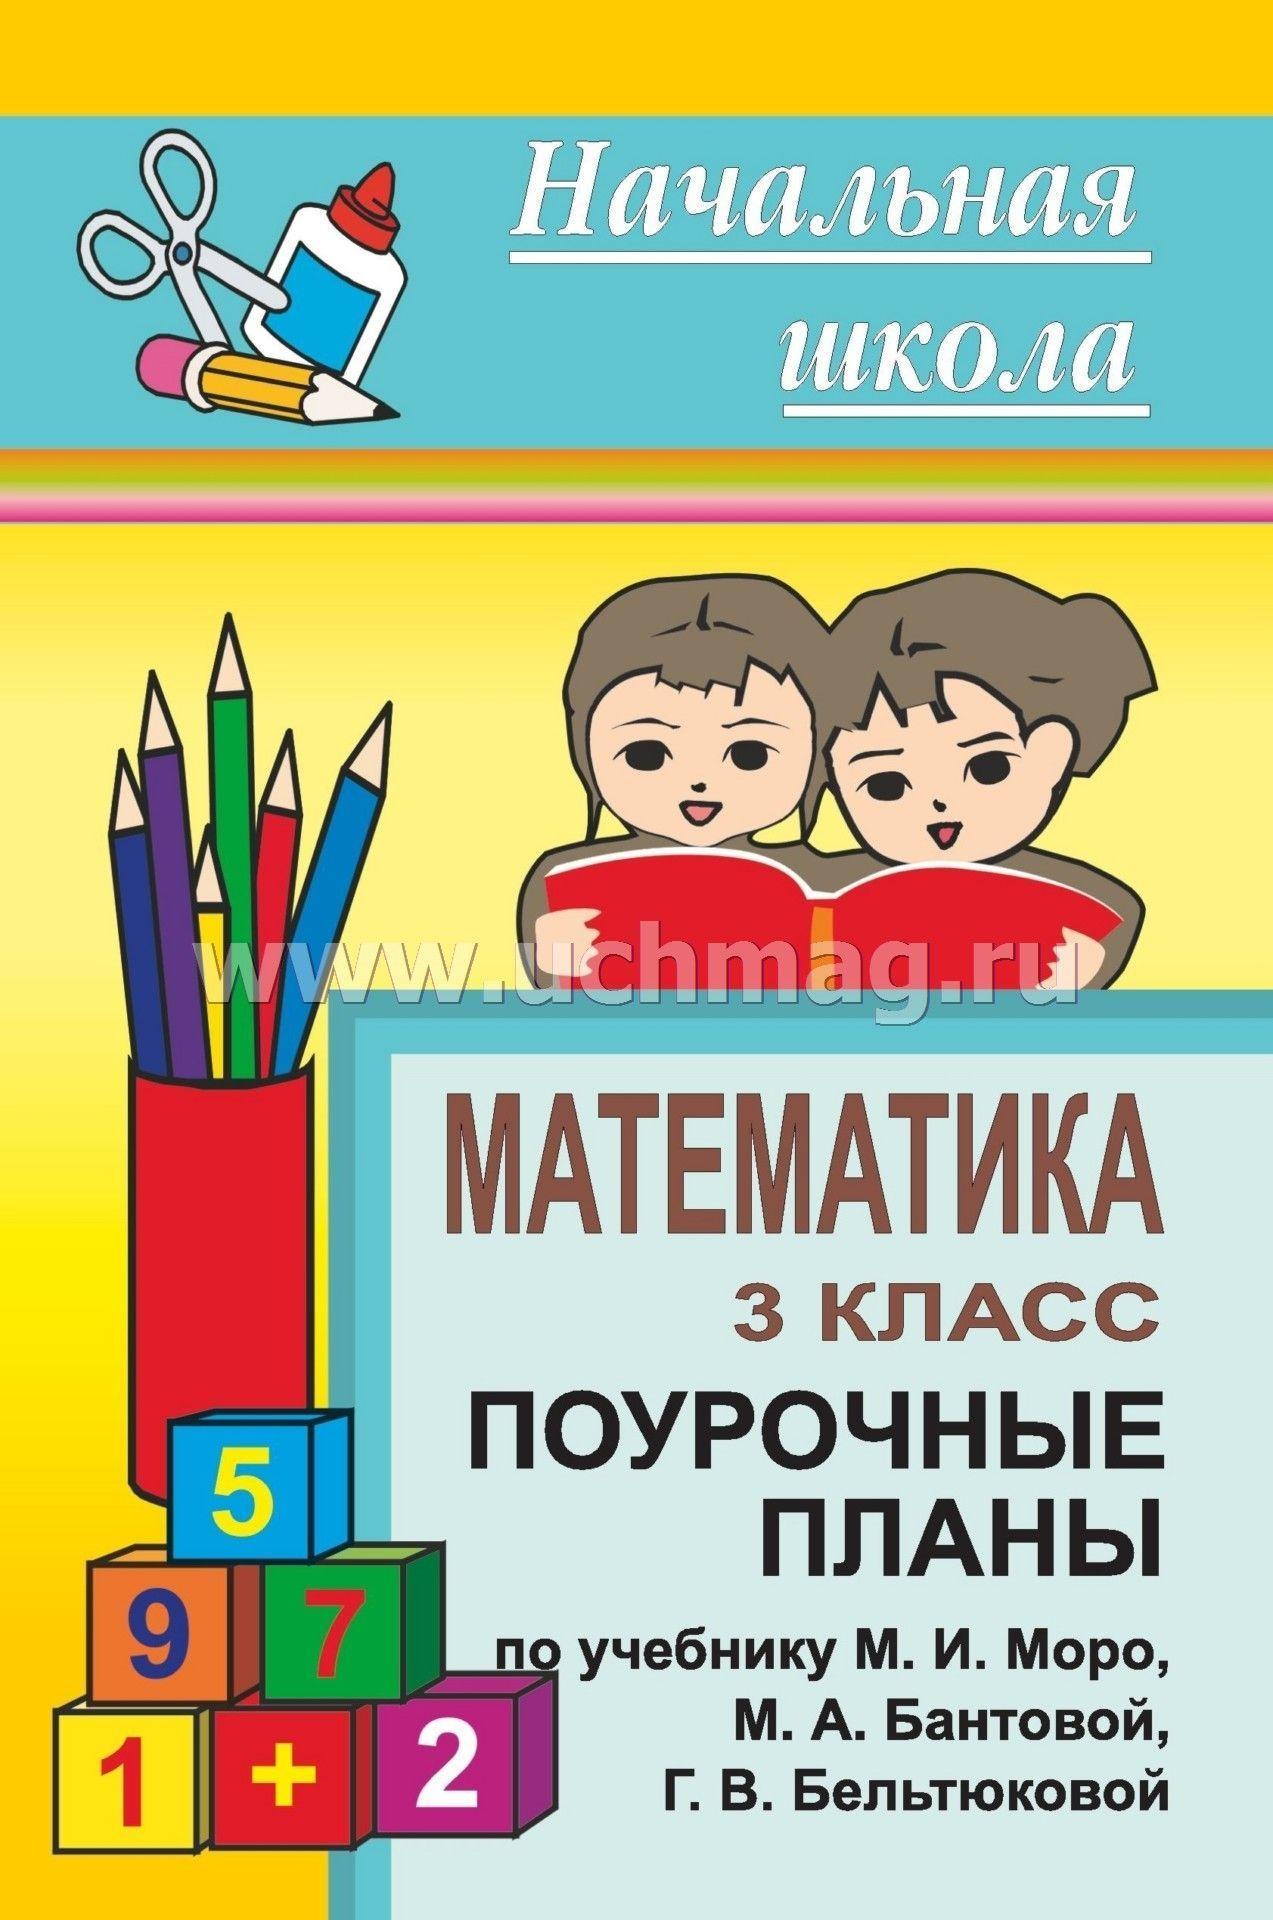 Математика 3 класс учебник моро задач 2013